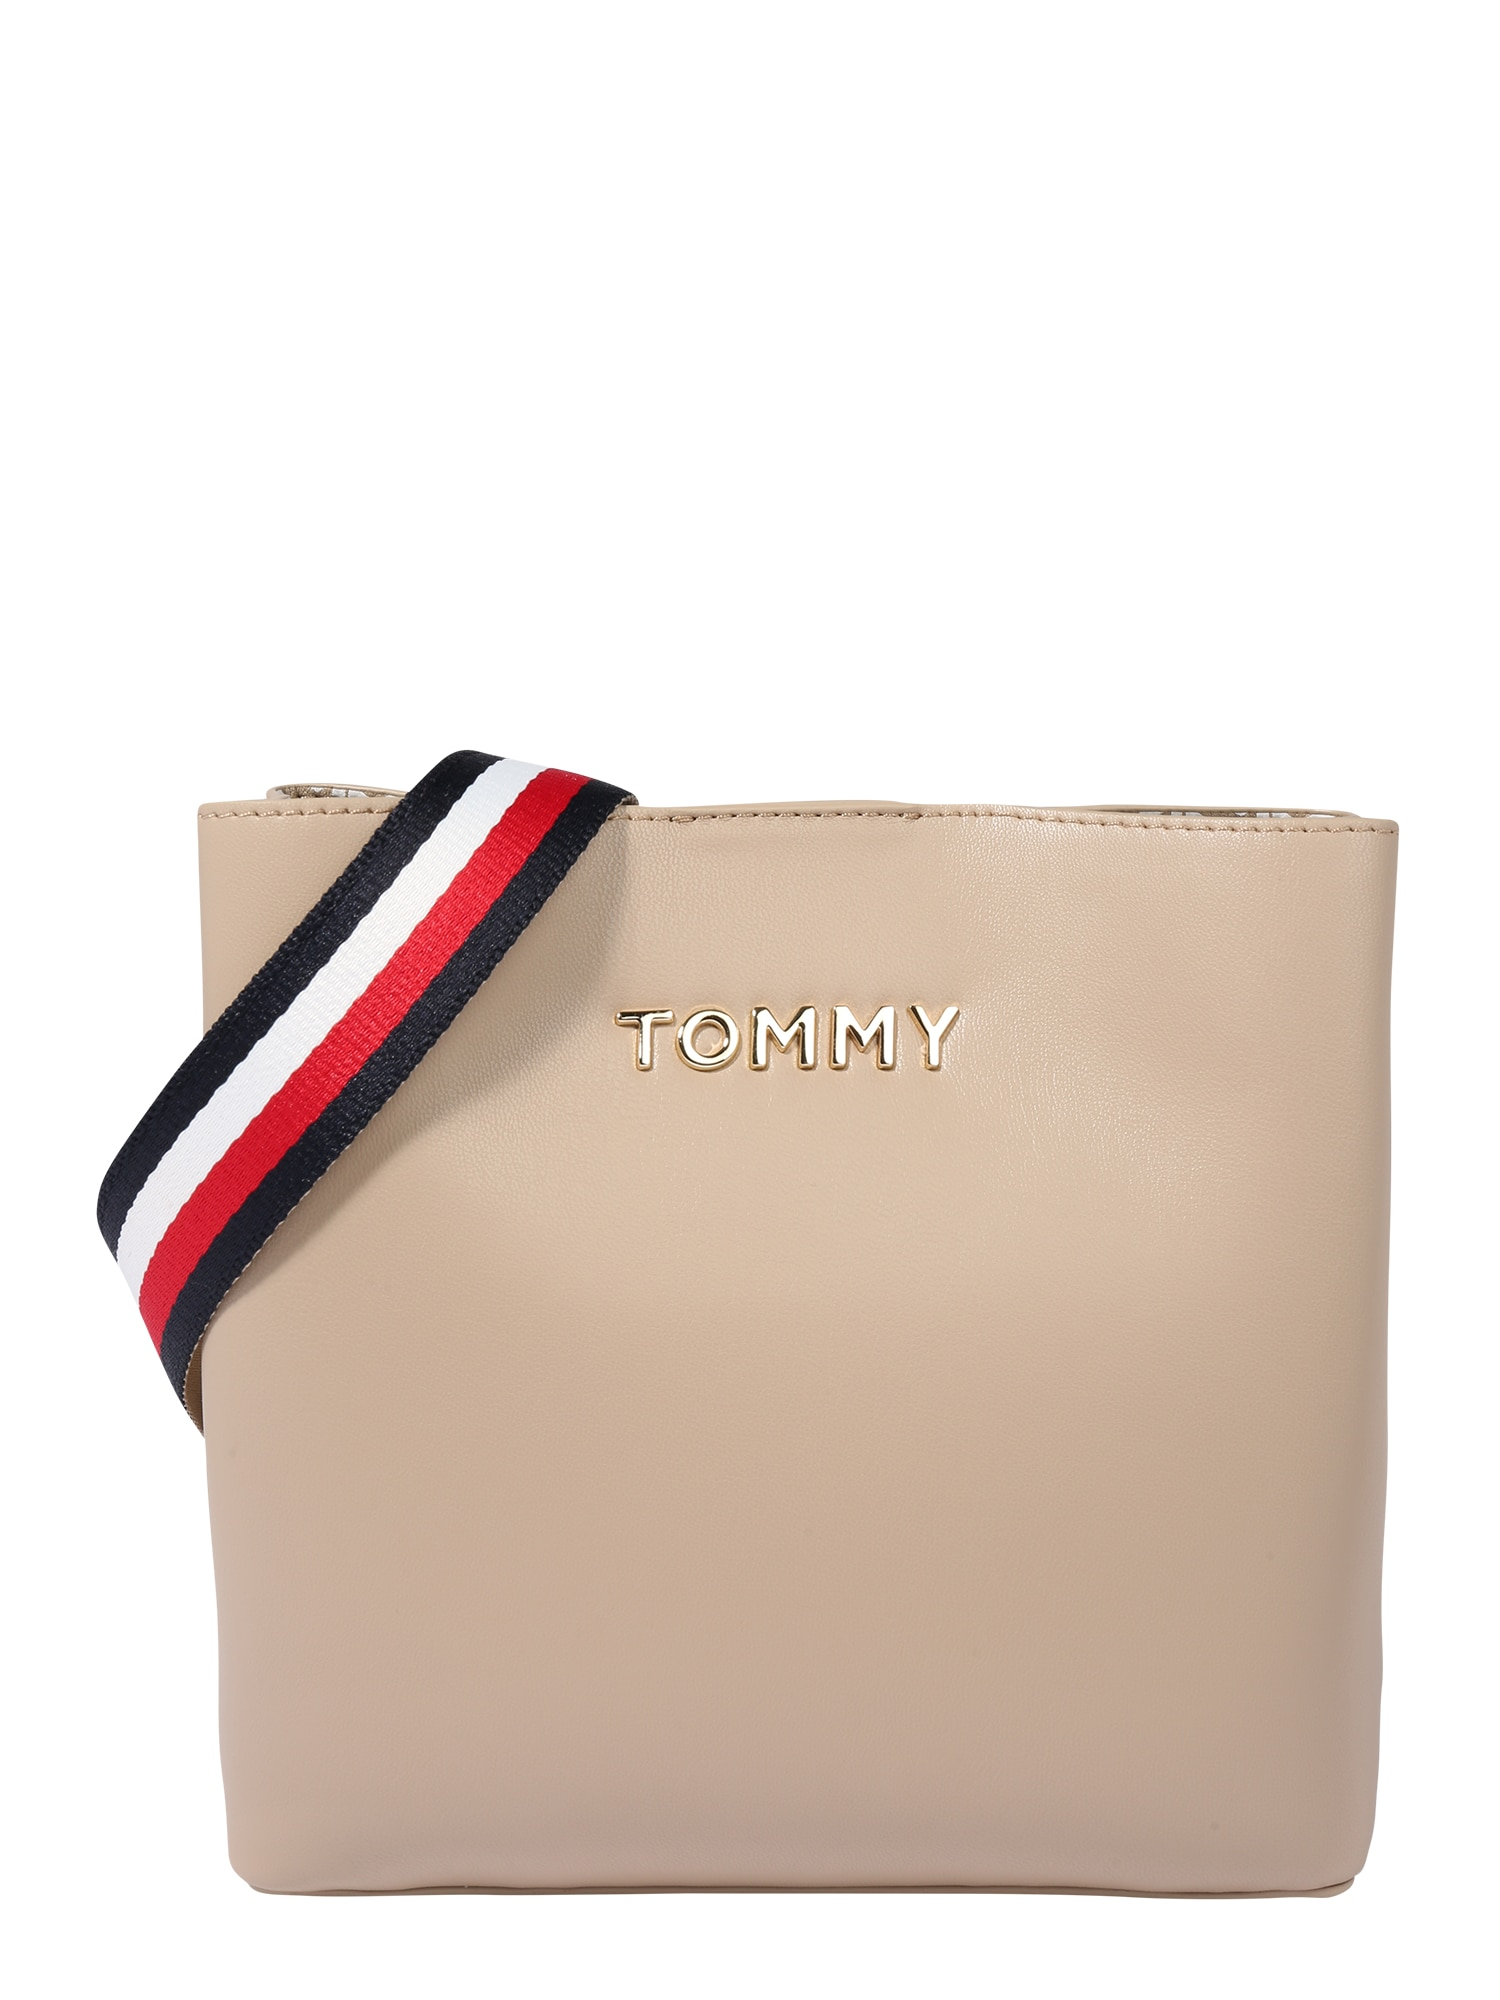 TOMMY HILFIGER Taška cez rameno  biela / béžová / zlatá / námornícka modrá / červené